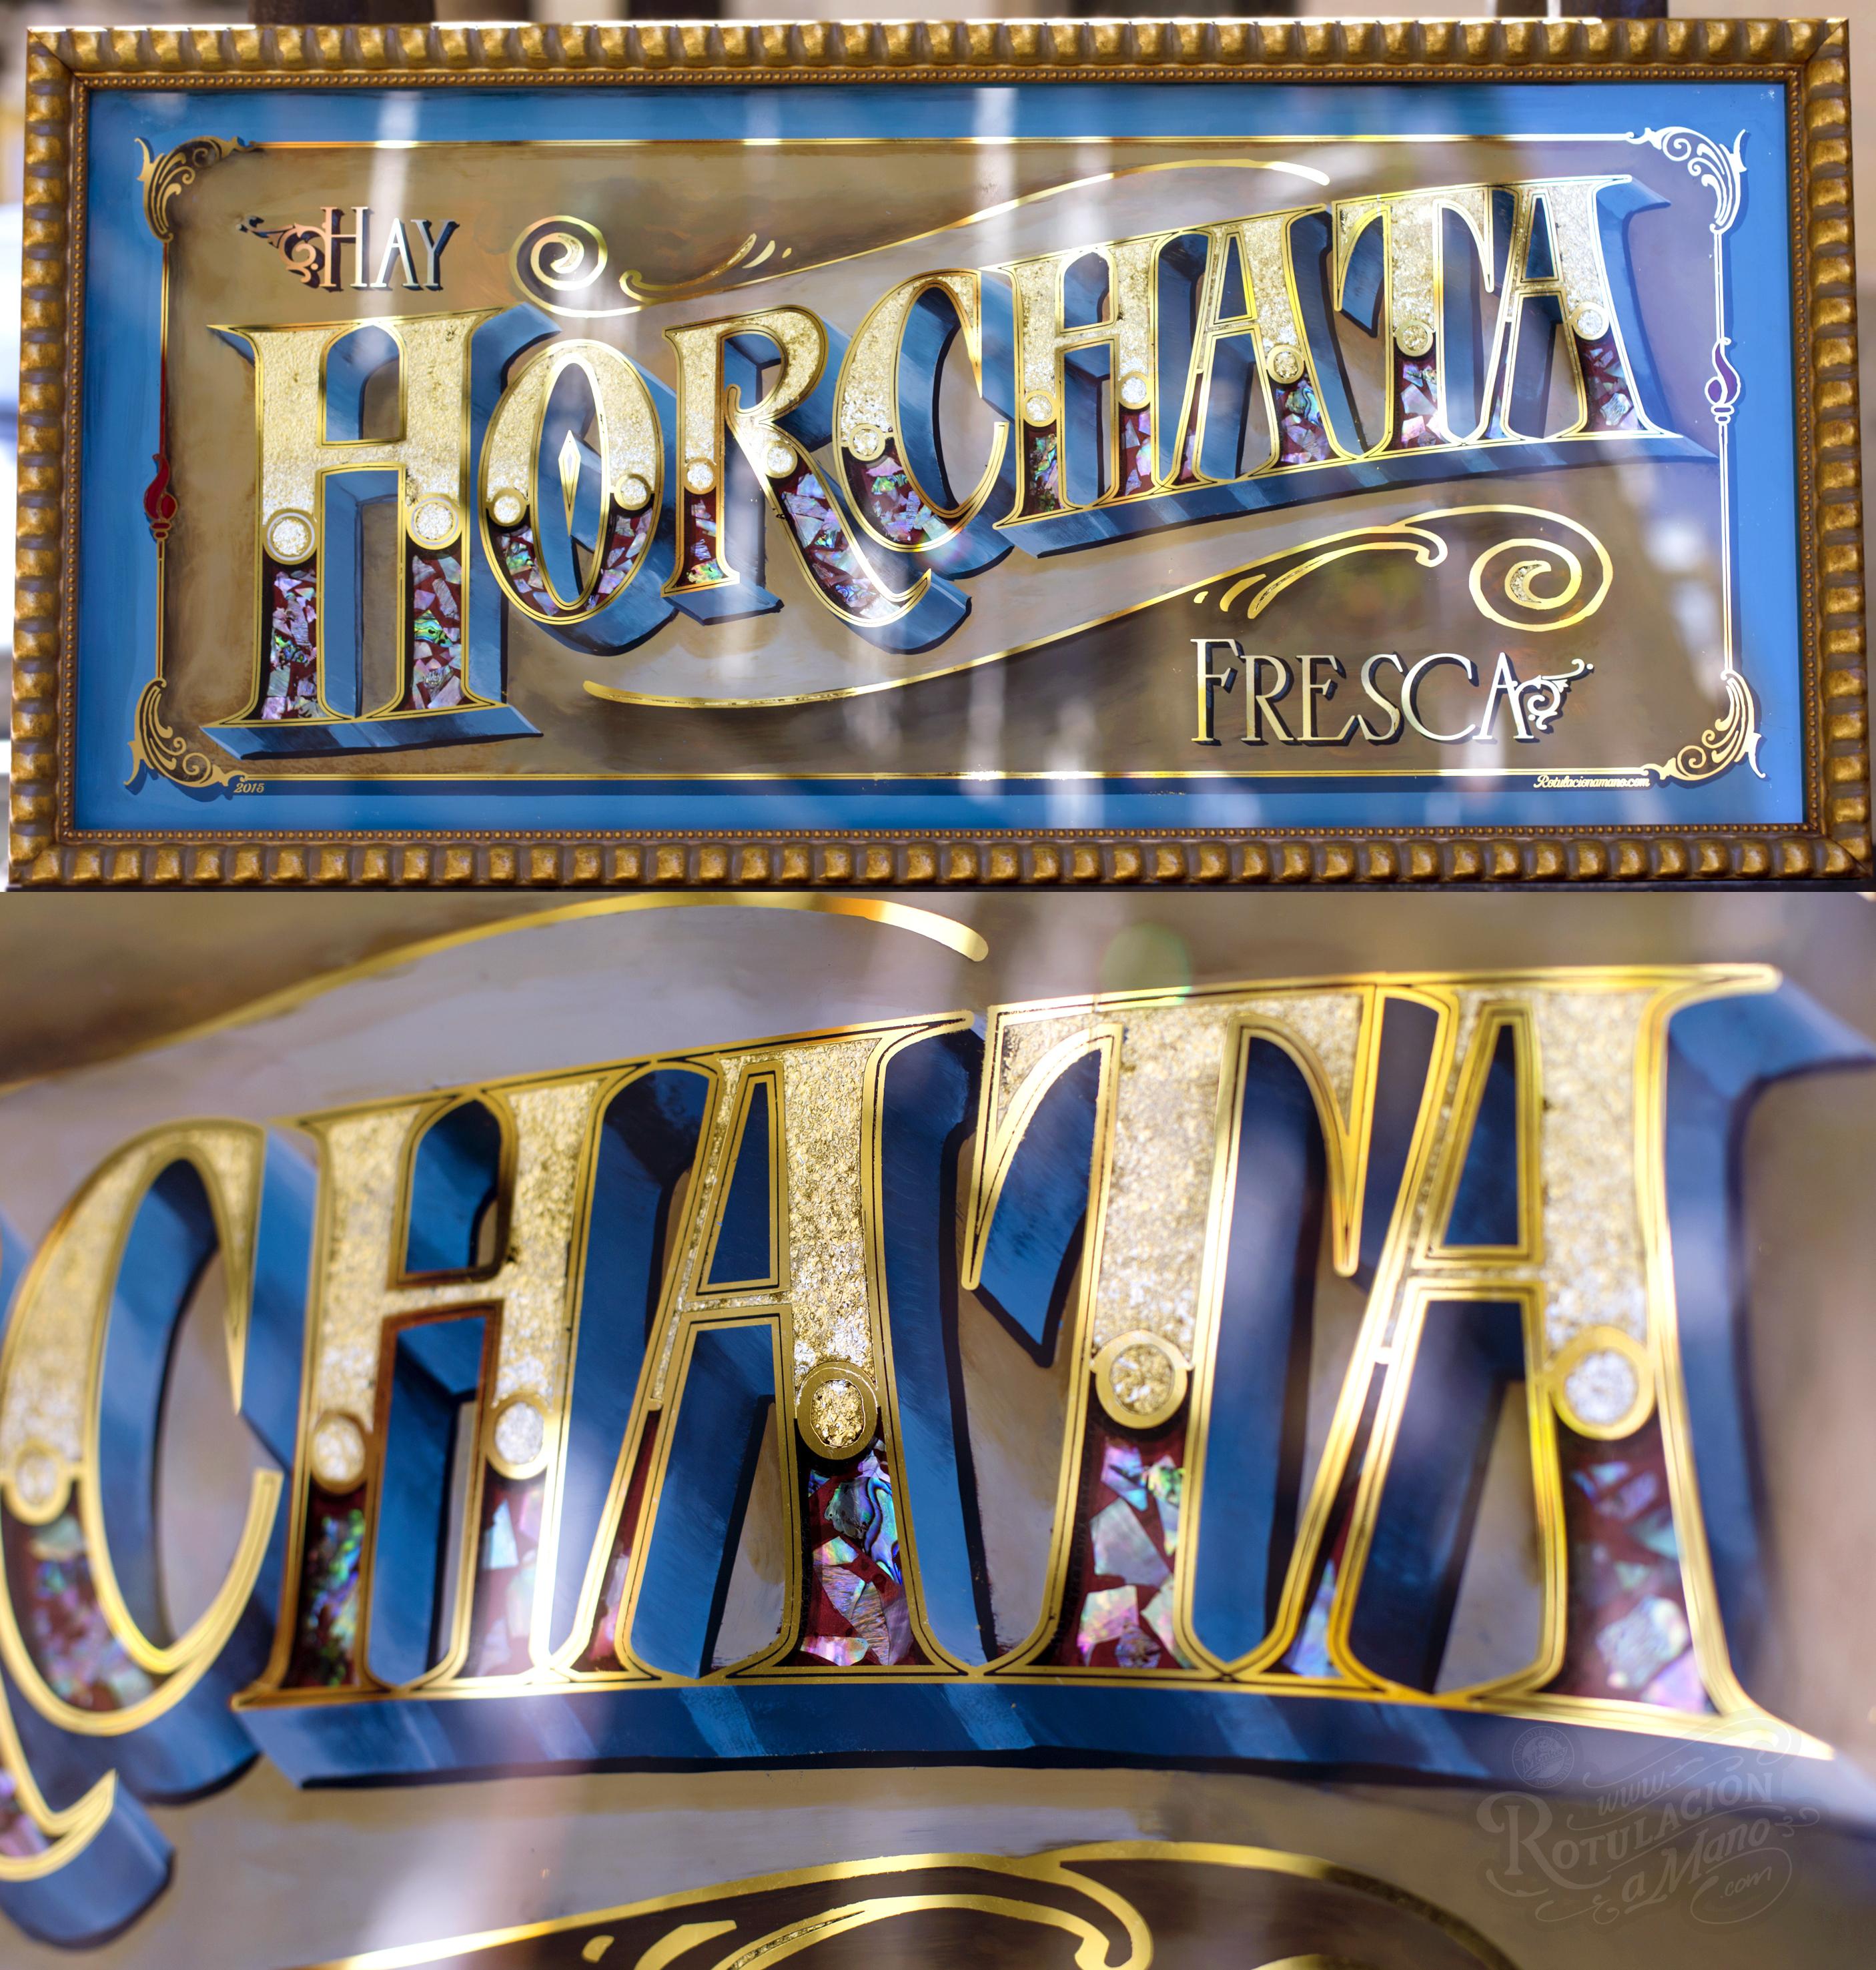 rotulo pan de oro horchata